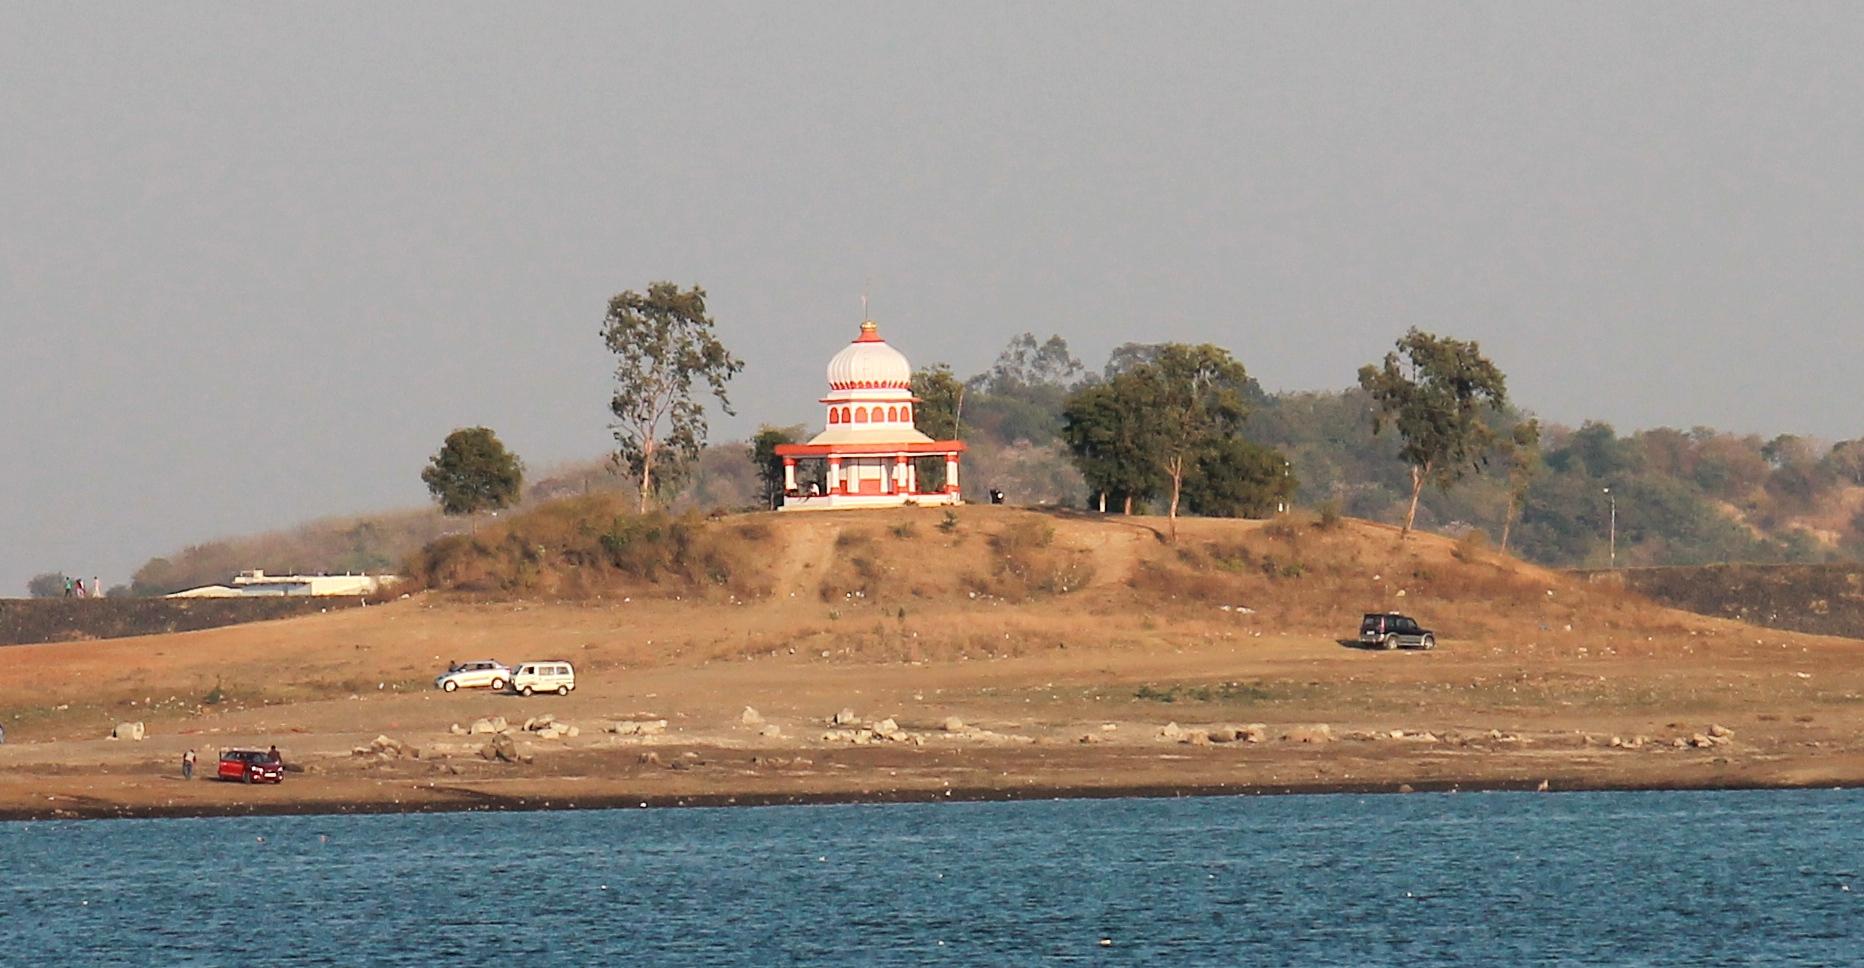 MP: bhopal weather